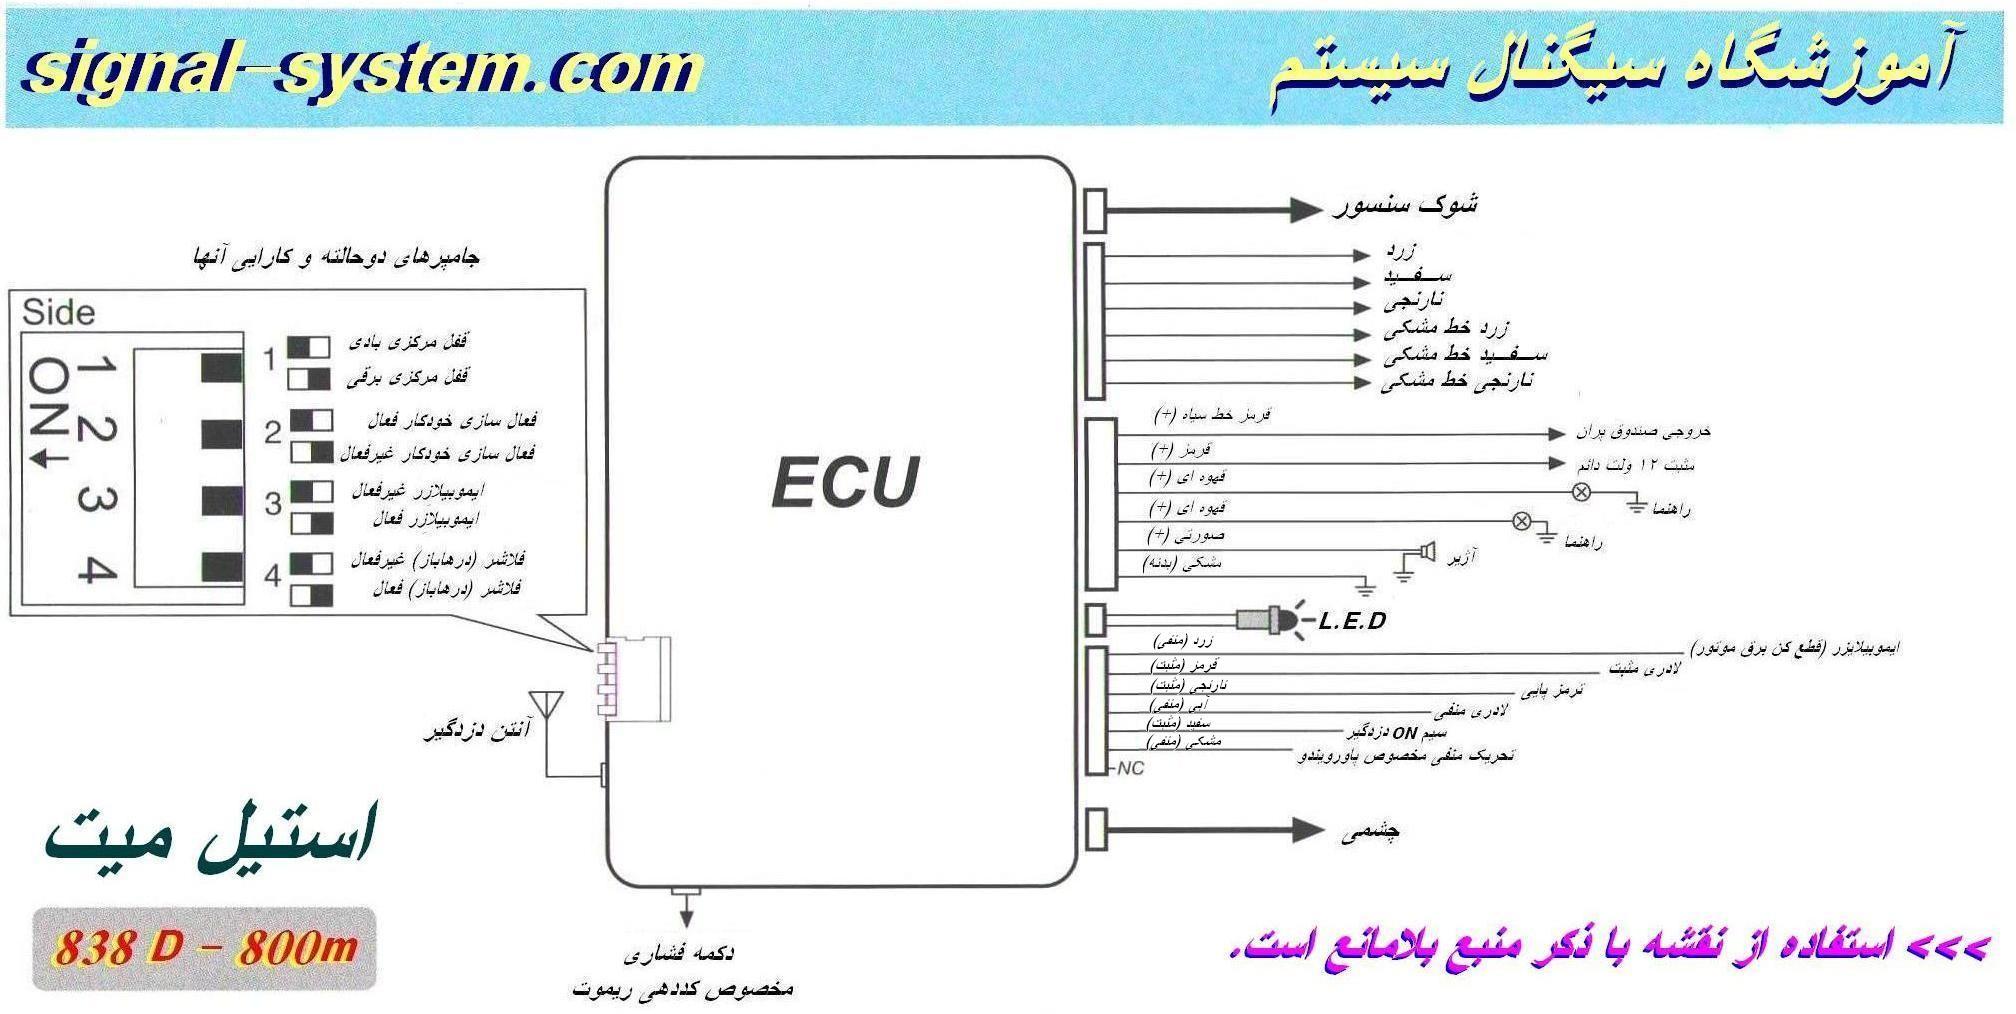 Steelmate Car Alarm 838 Wiring Diagram Car Alarm Wiring Diagram Of Steelmate Car Alarm 838 Wiring Diagram